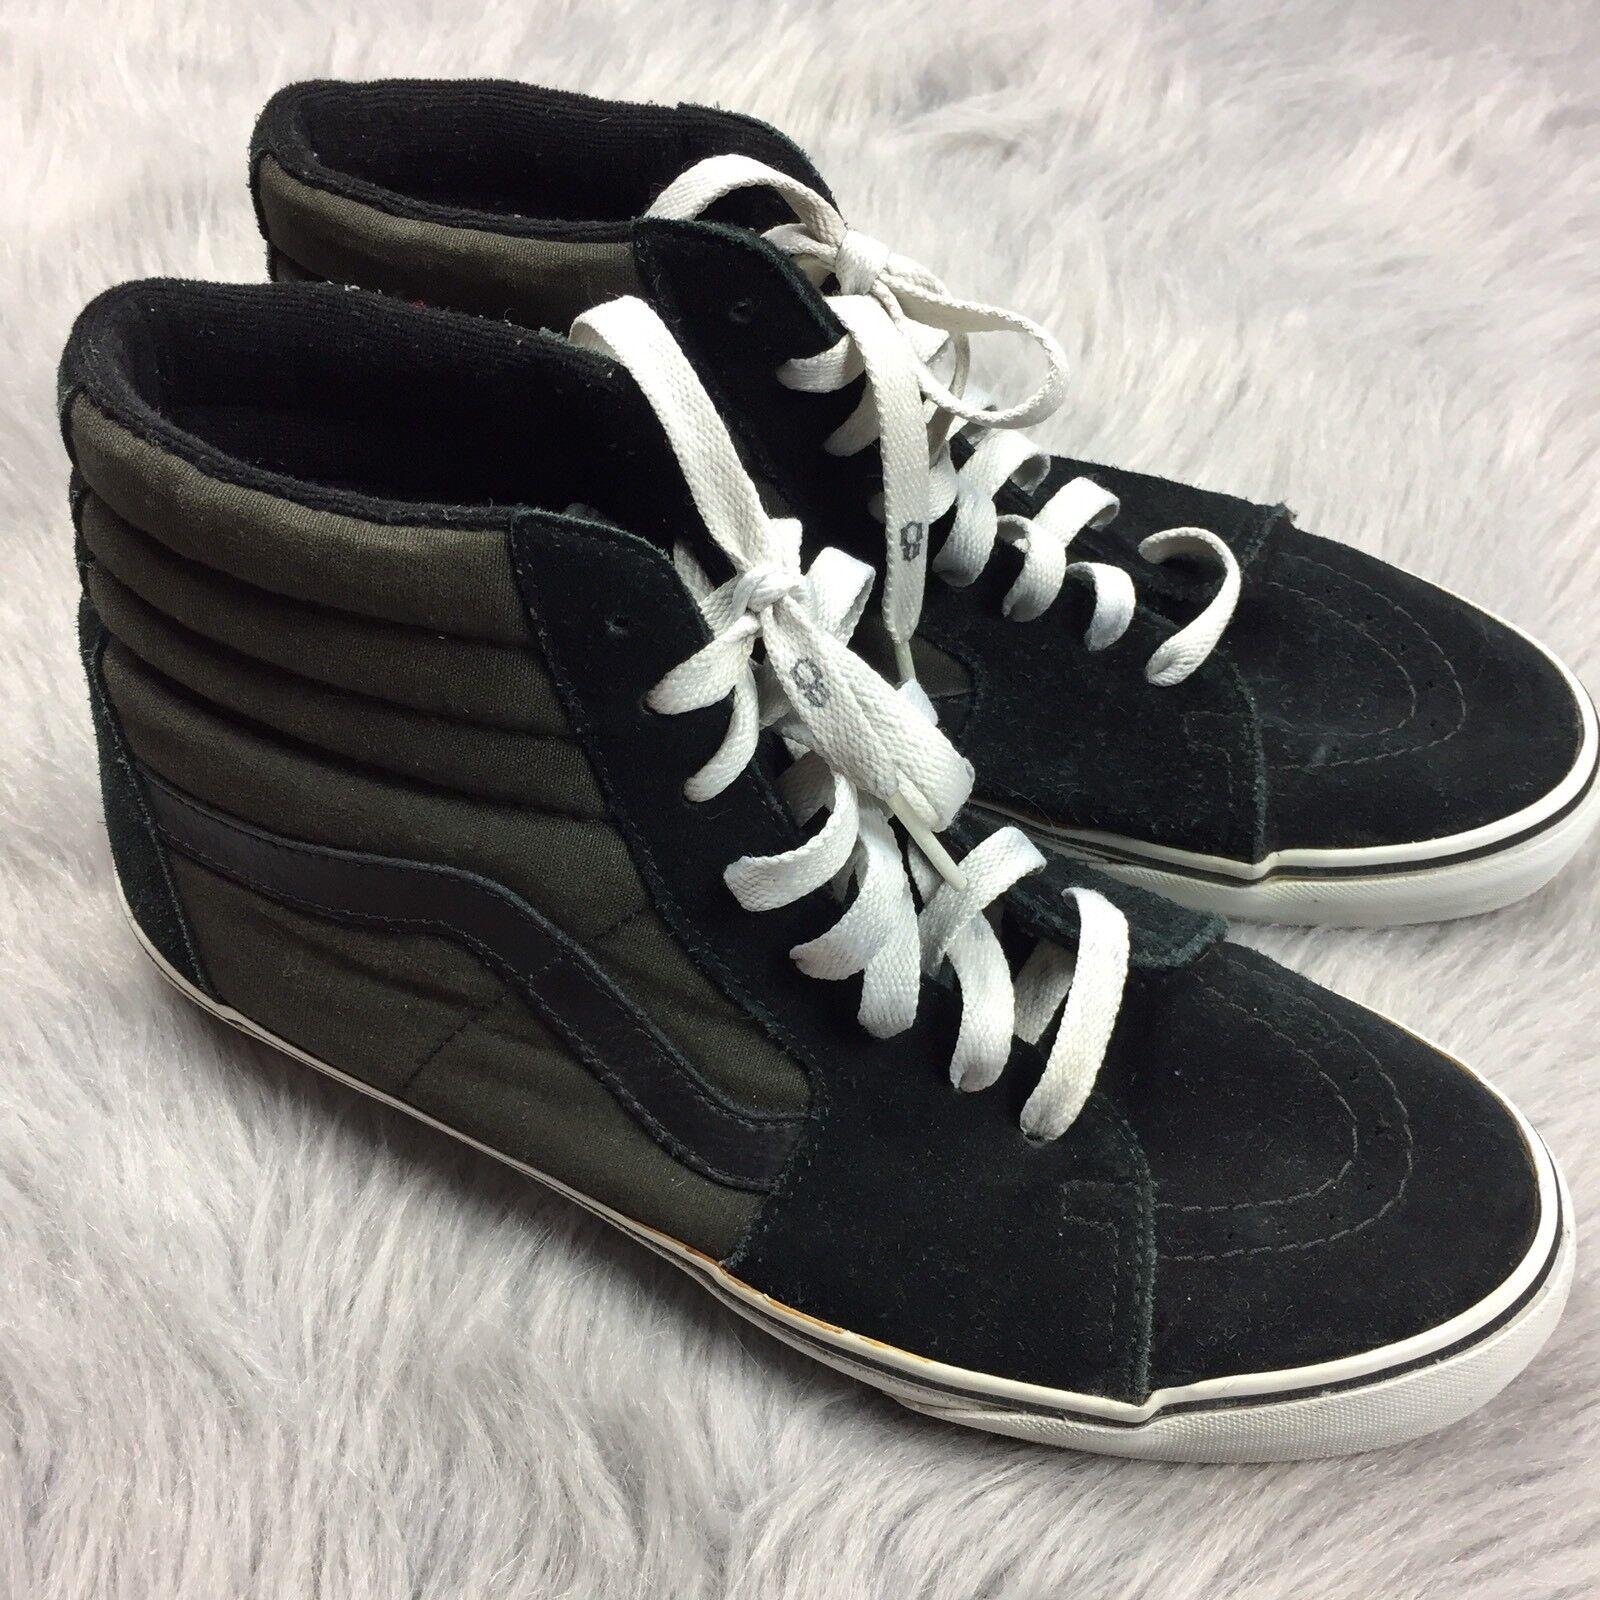 Heavily Worn RARE Rebel 8 Black Gray Vans Sk8 Hi Shoes Sz 10.5